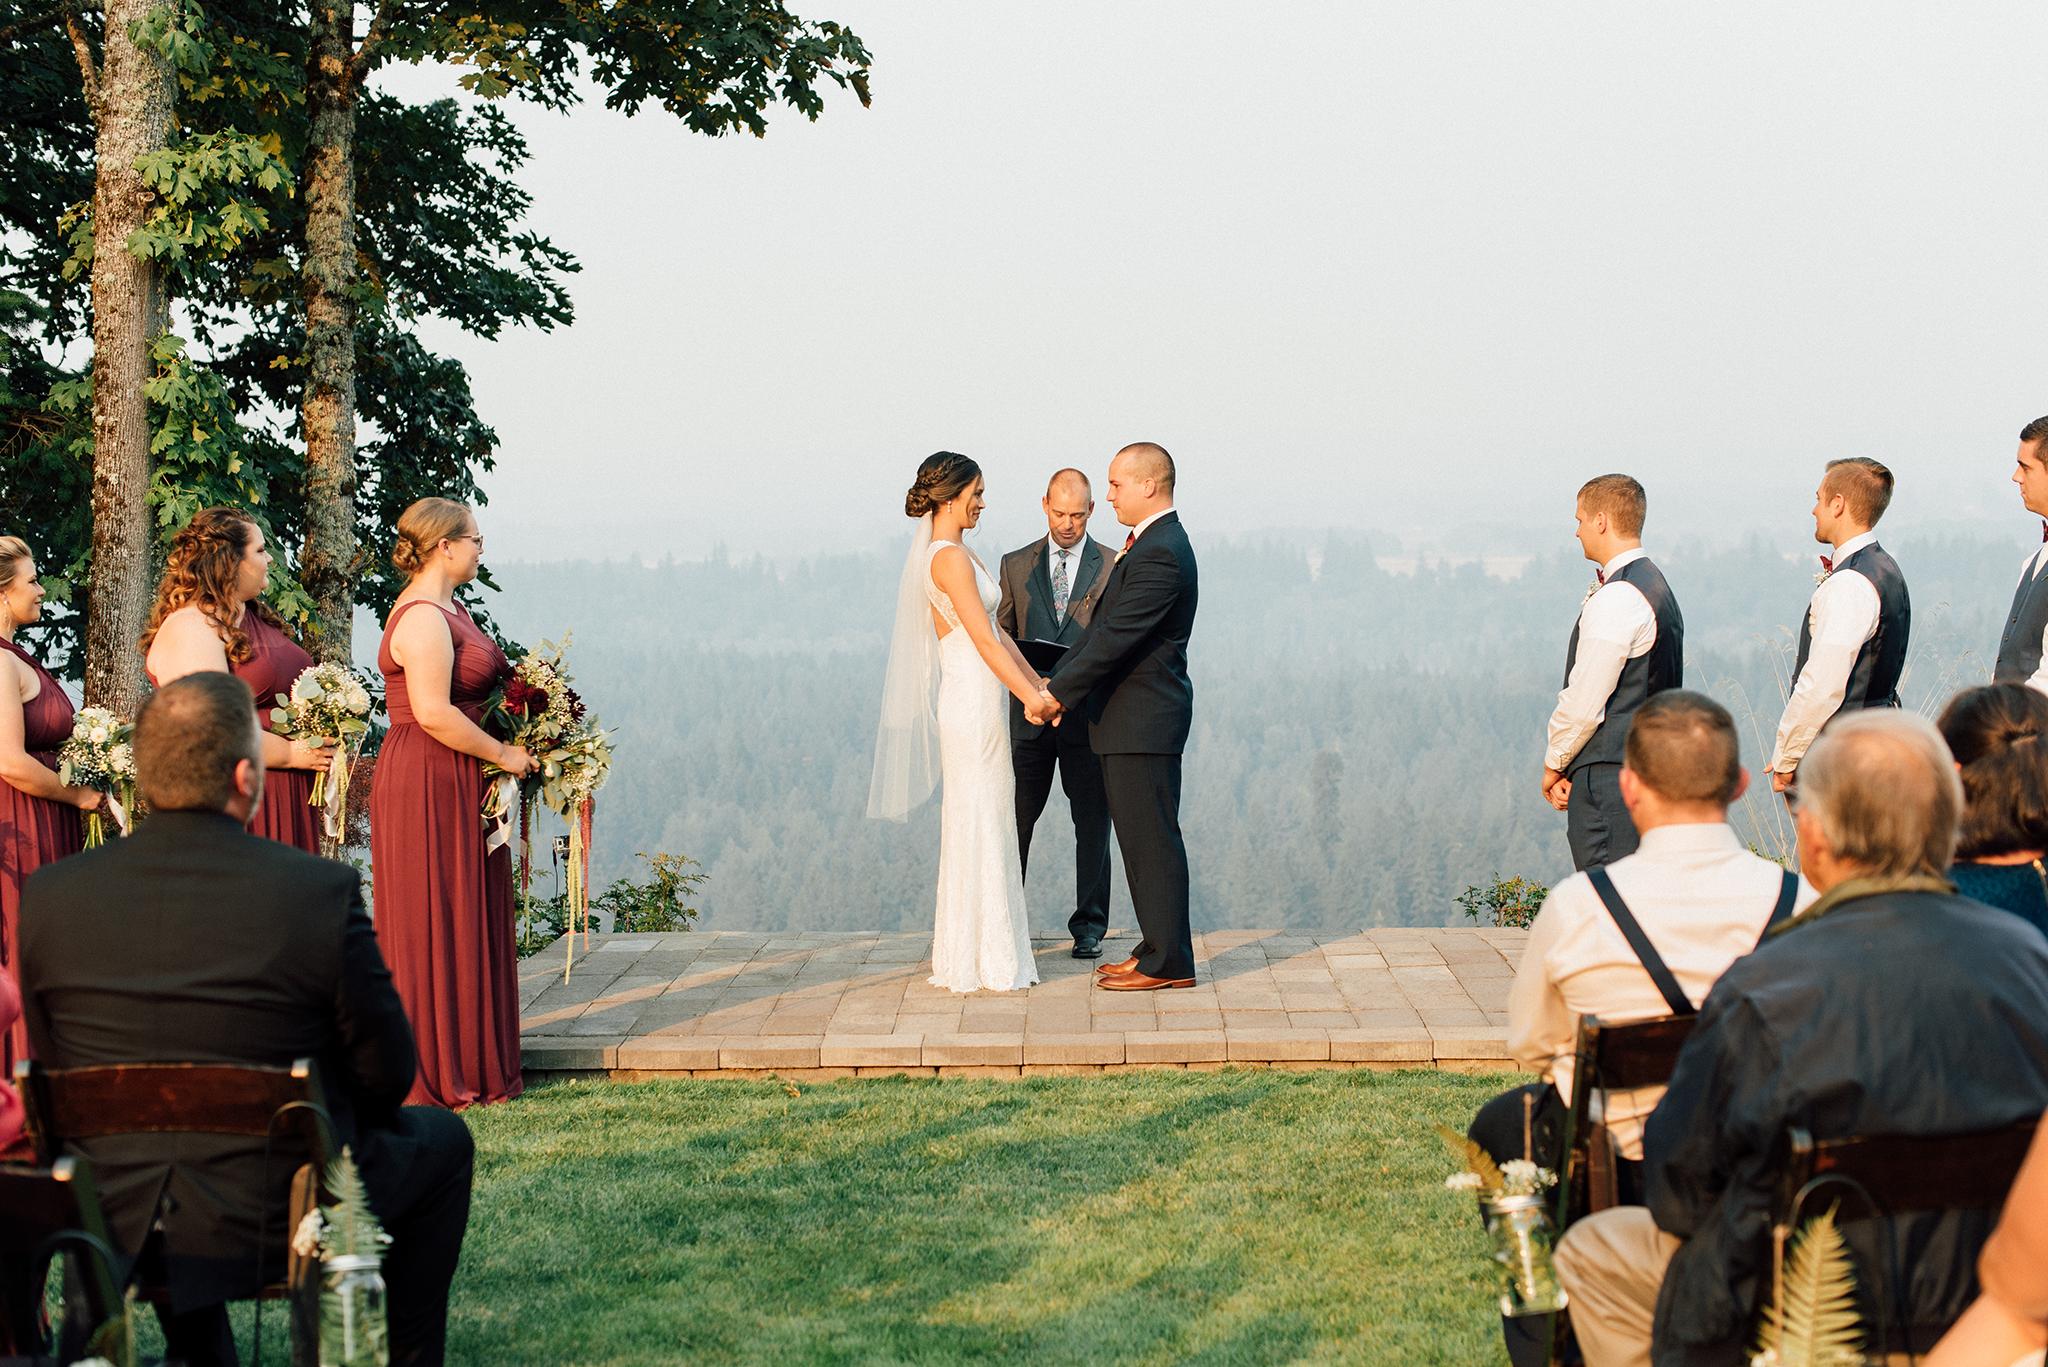 Liza James Photography | Portland Wedding Photographer BLOG 12.png